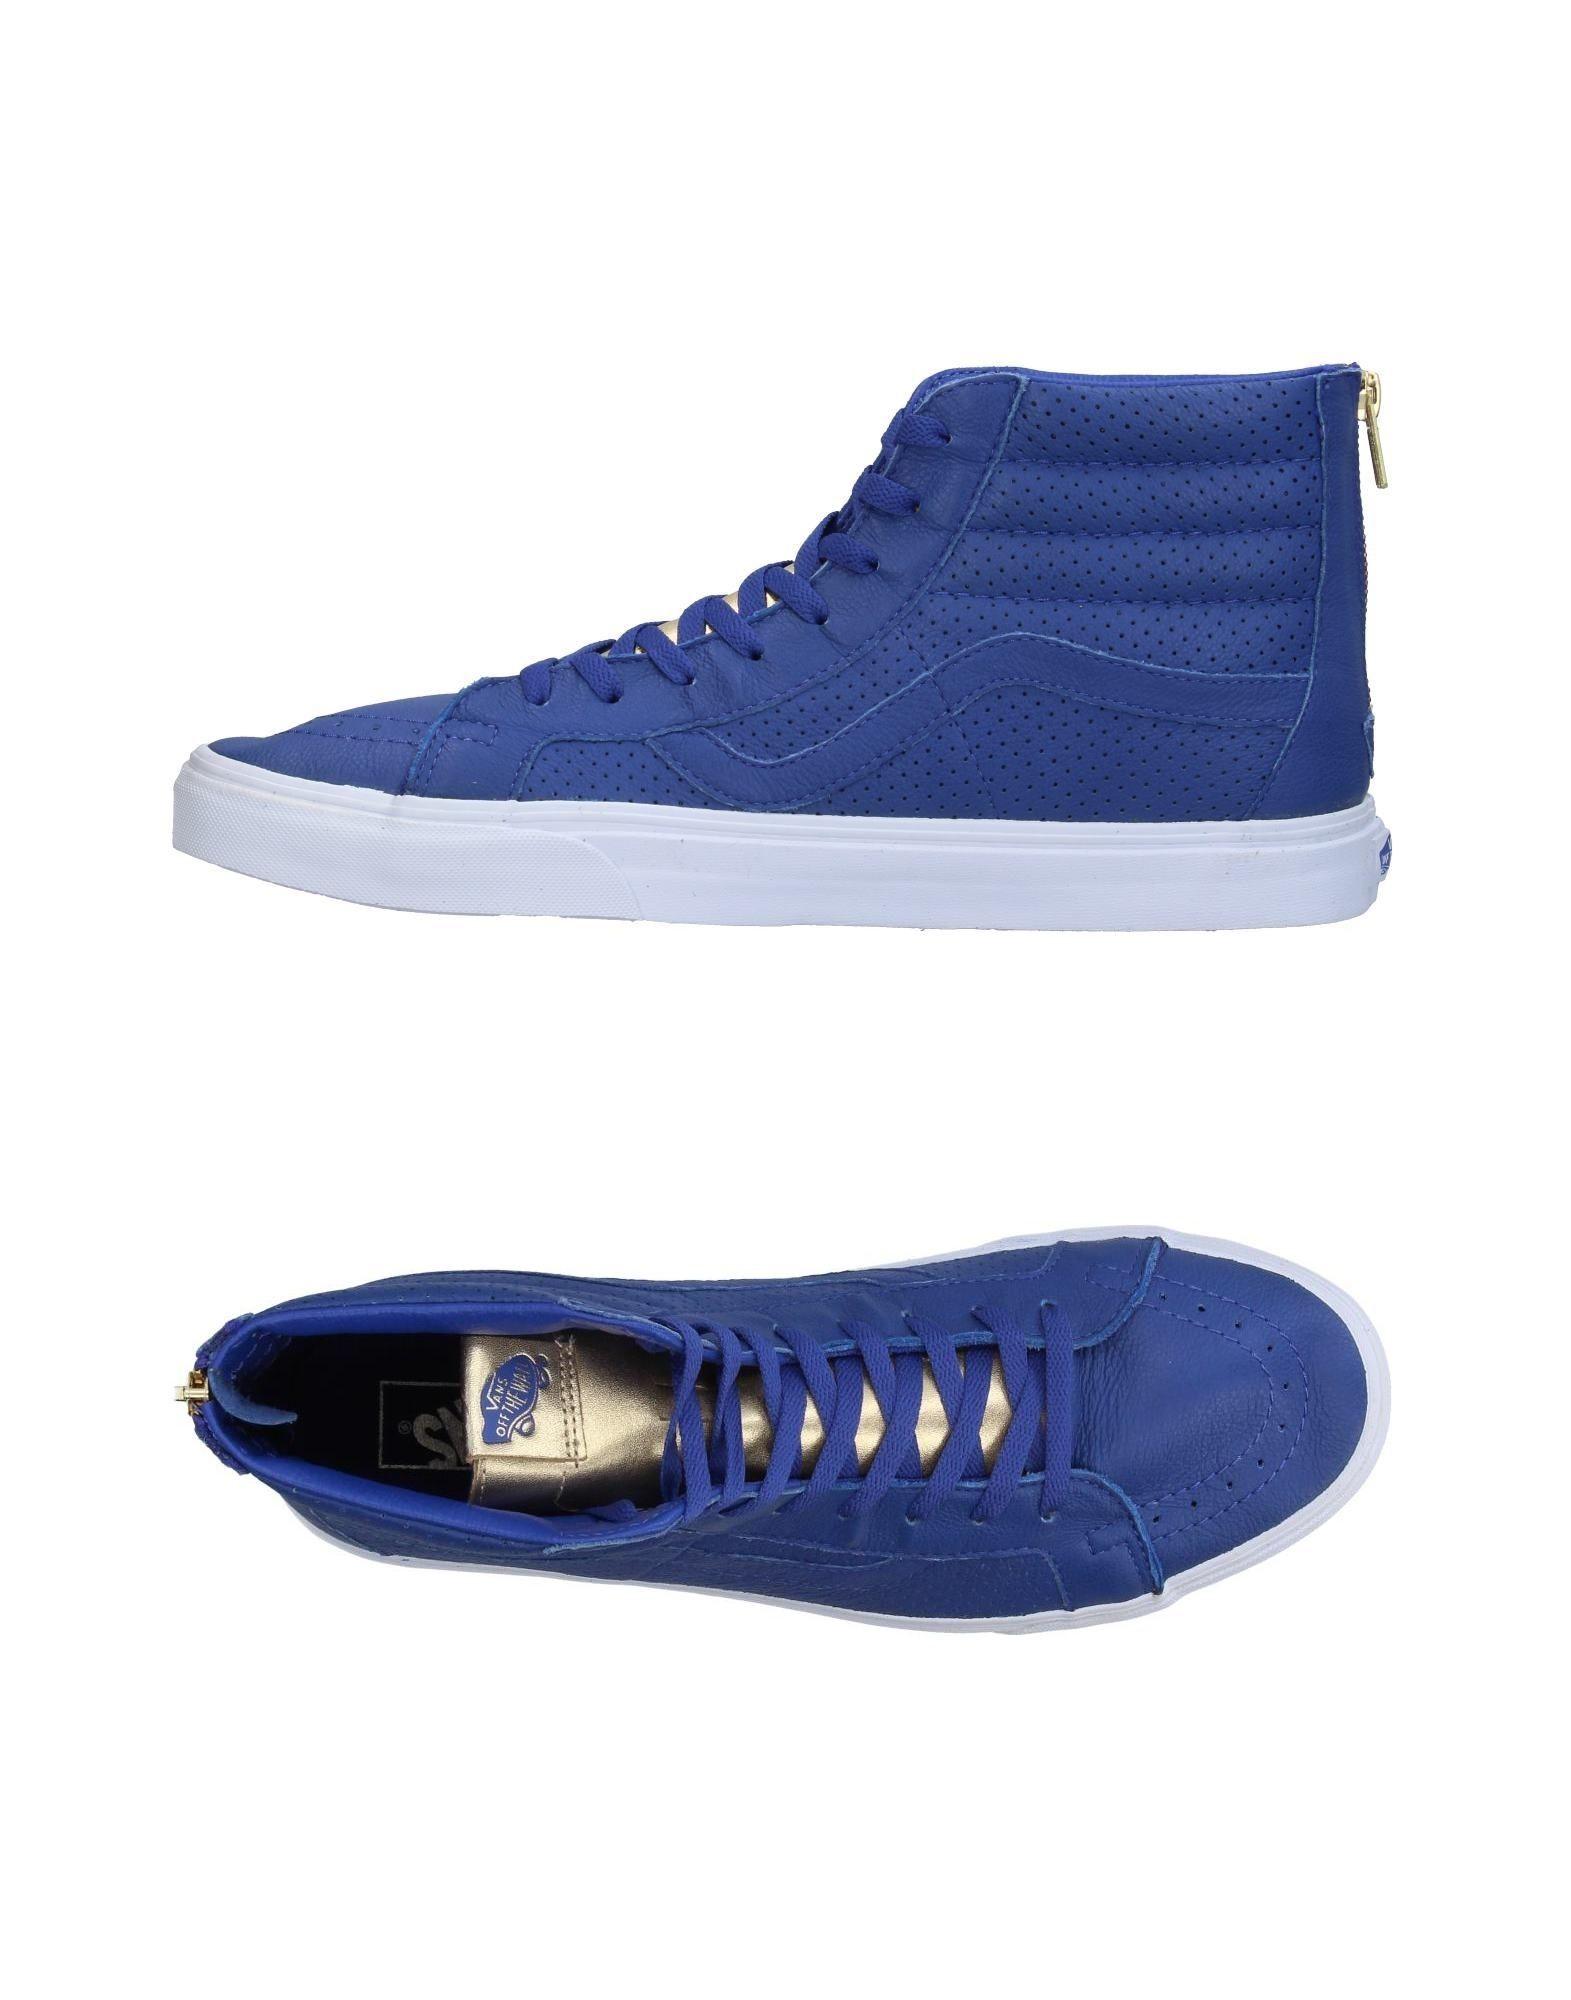 Moda Sneakers Vans Uomo - 11384167EB